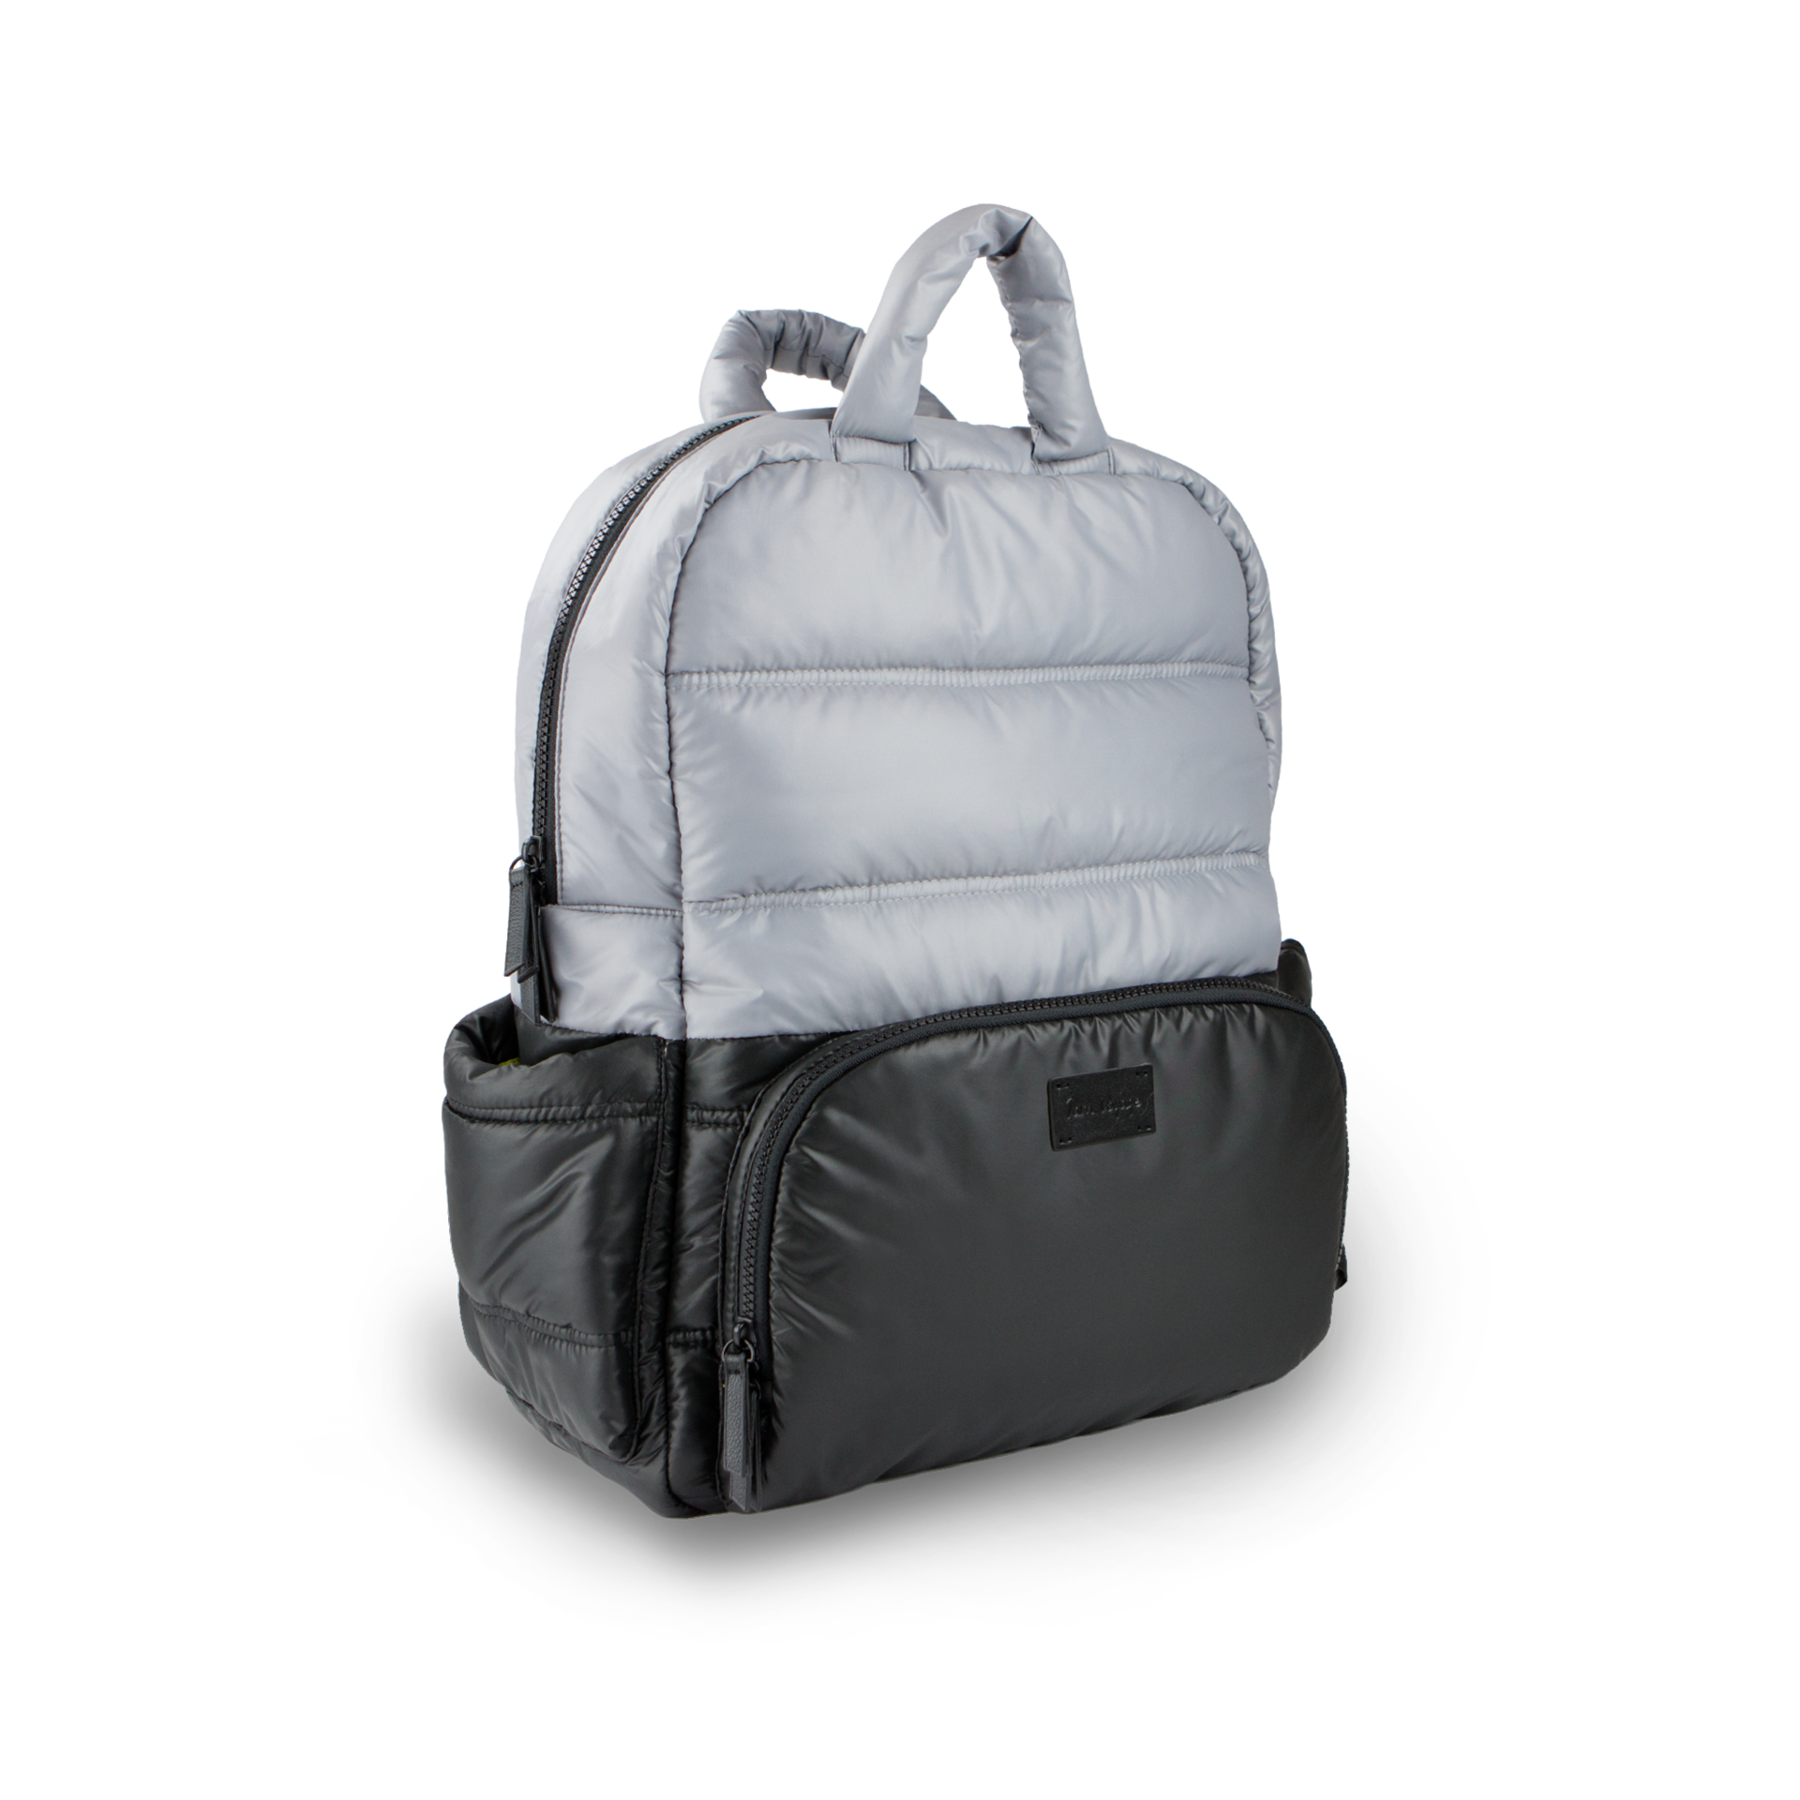 7AM - Plecak BK718 BackPack Black Cement